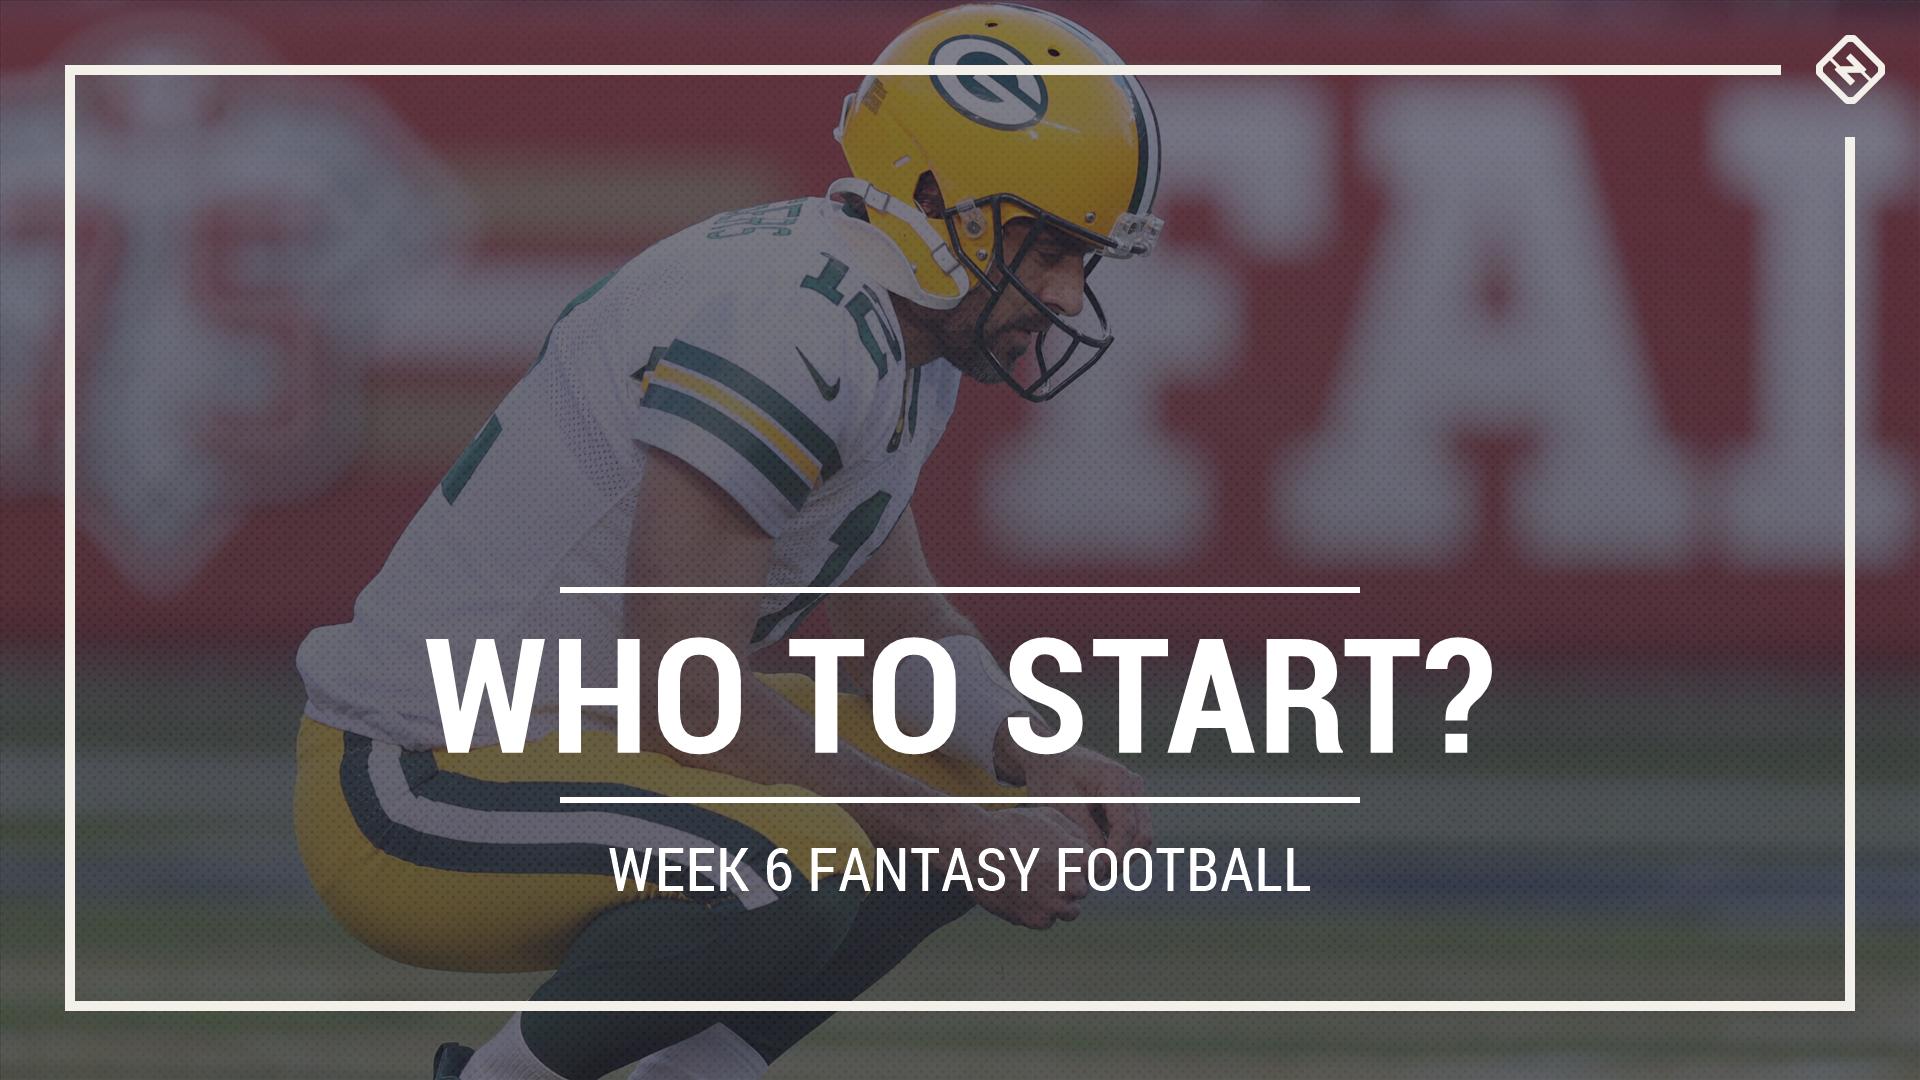 Who to start in fantasy football: Week 6 rankings, start-sit advice for PPR, standard, superflex scoring